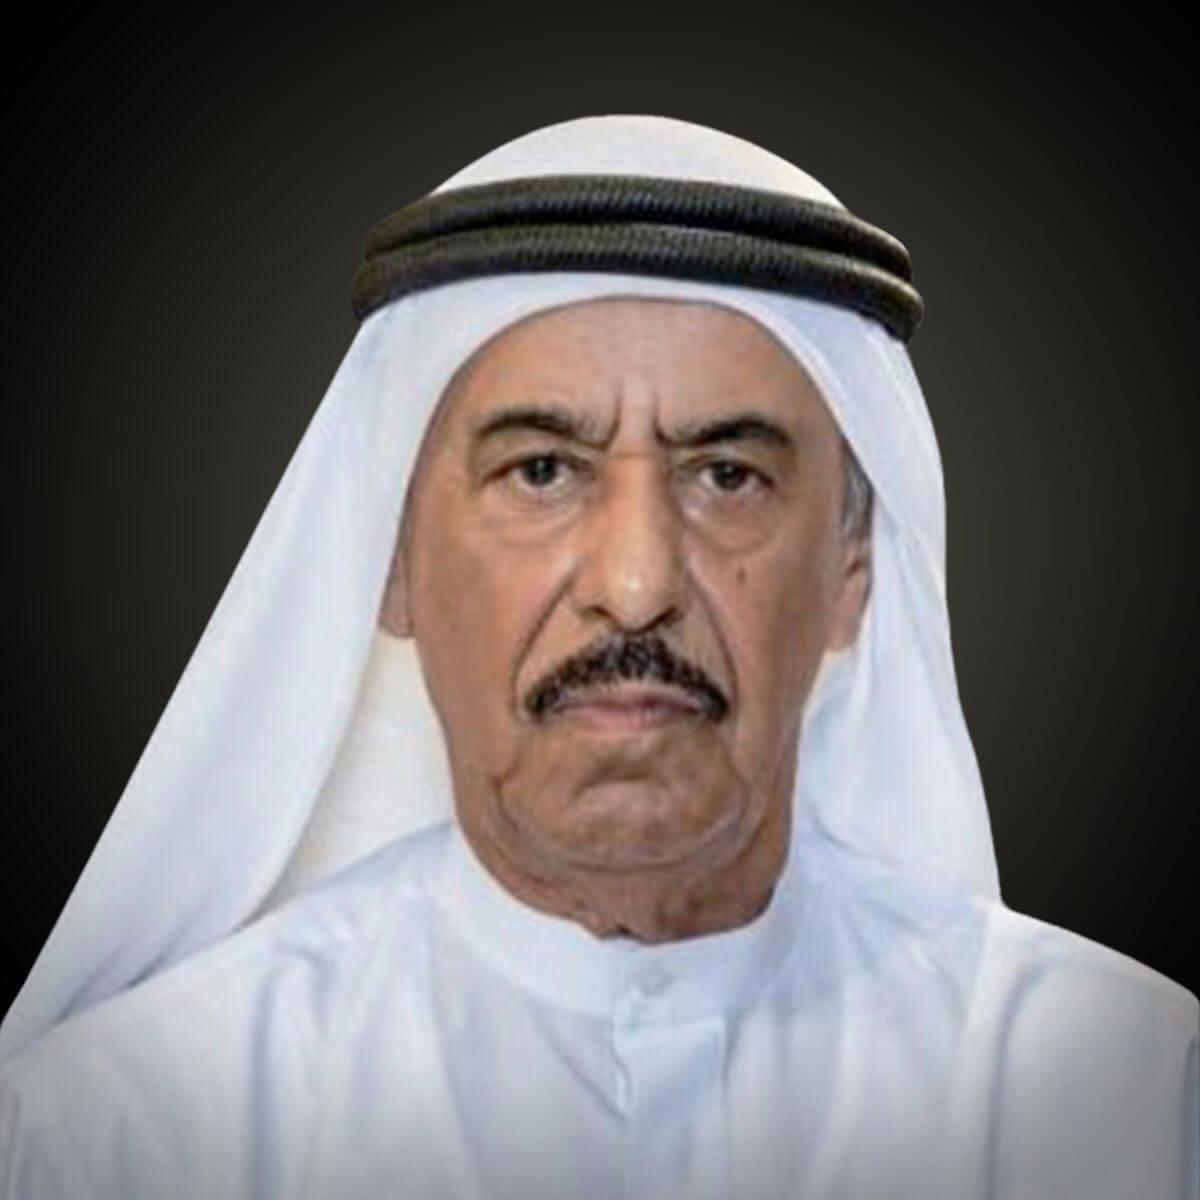 Khalifa Juma Al Nabooda Group